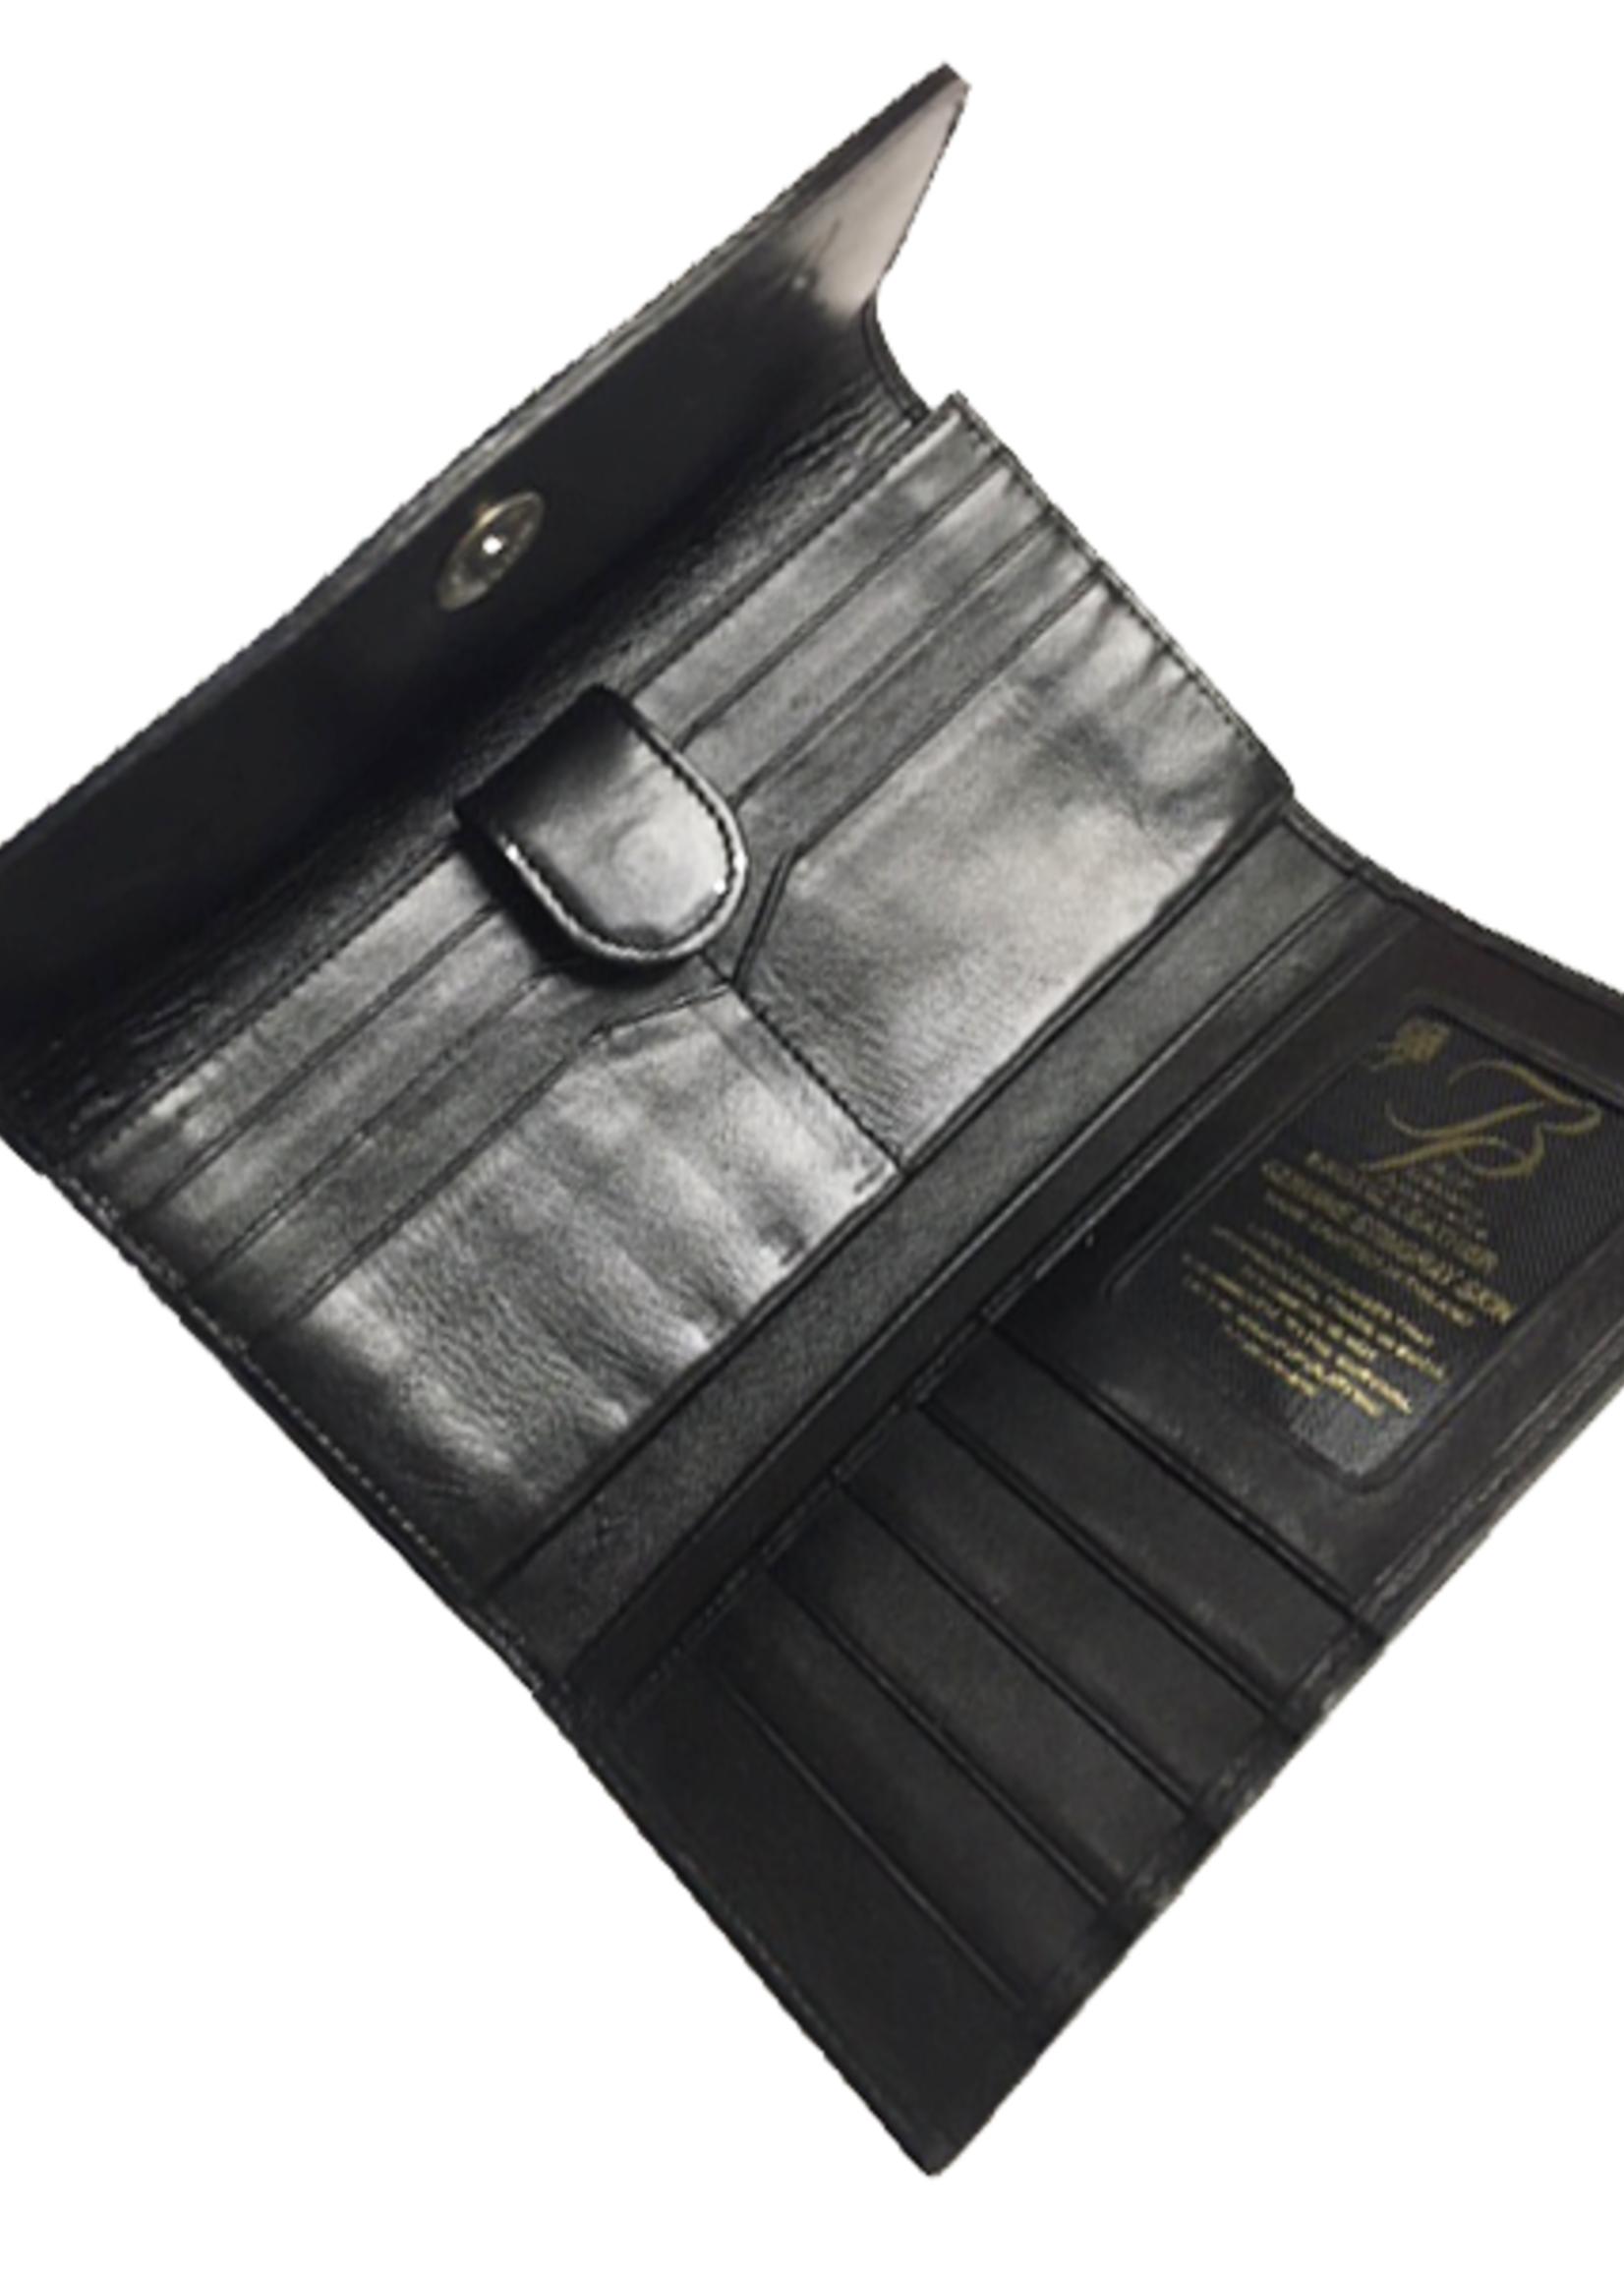 Crocodile & Stingray Products Stingray Leather Purse - Black